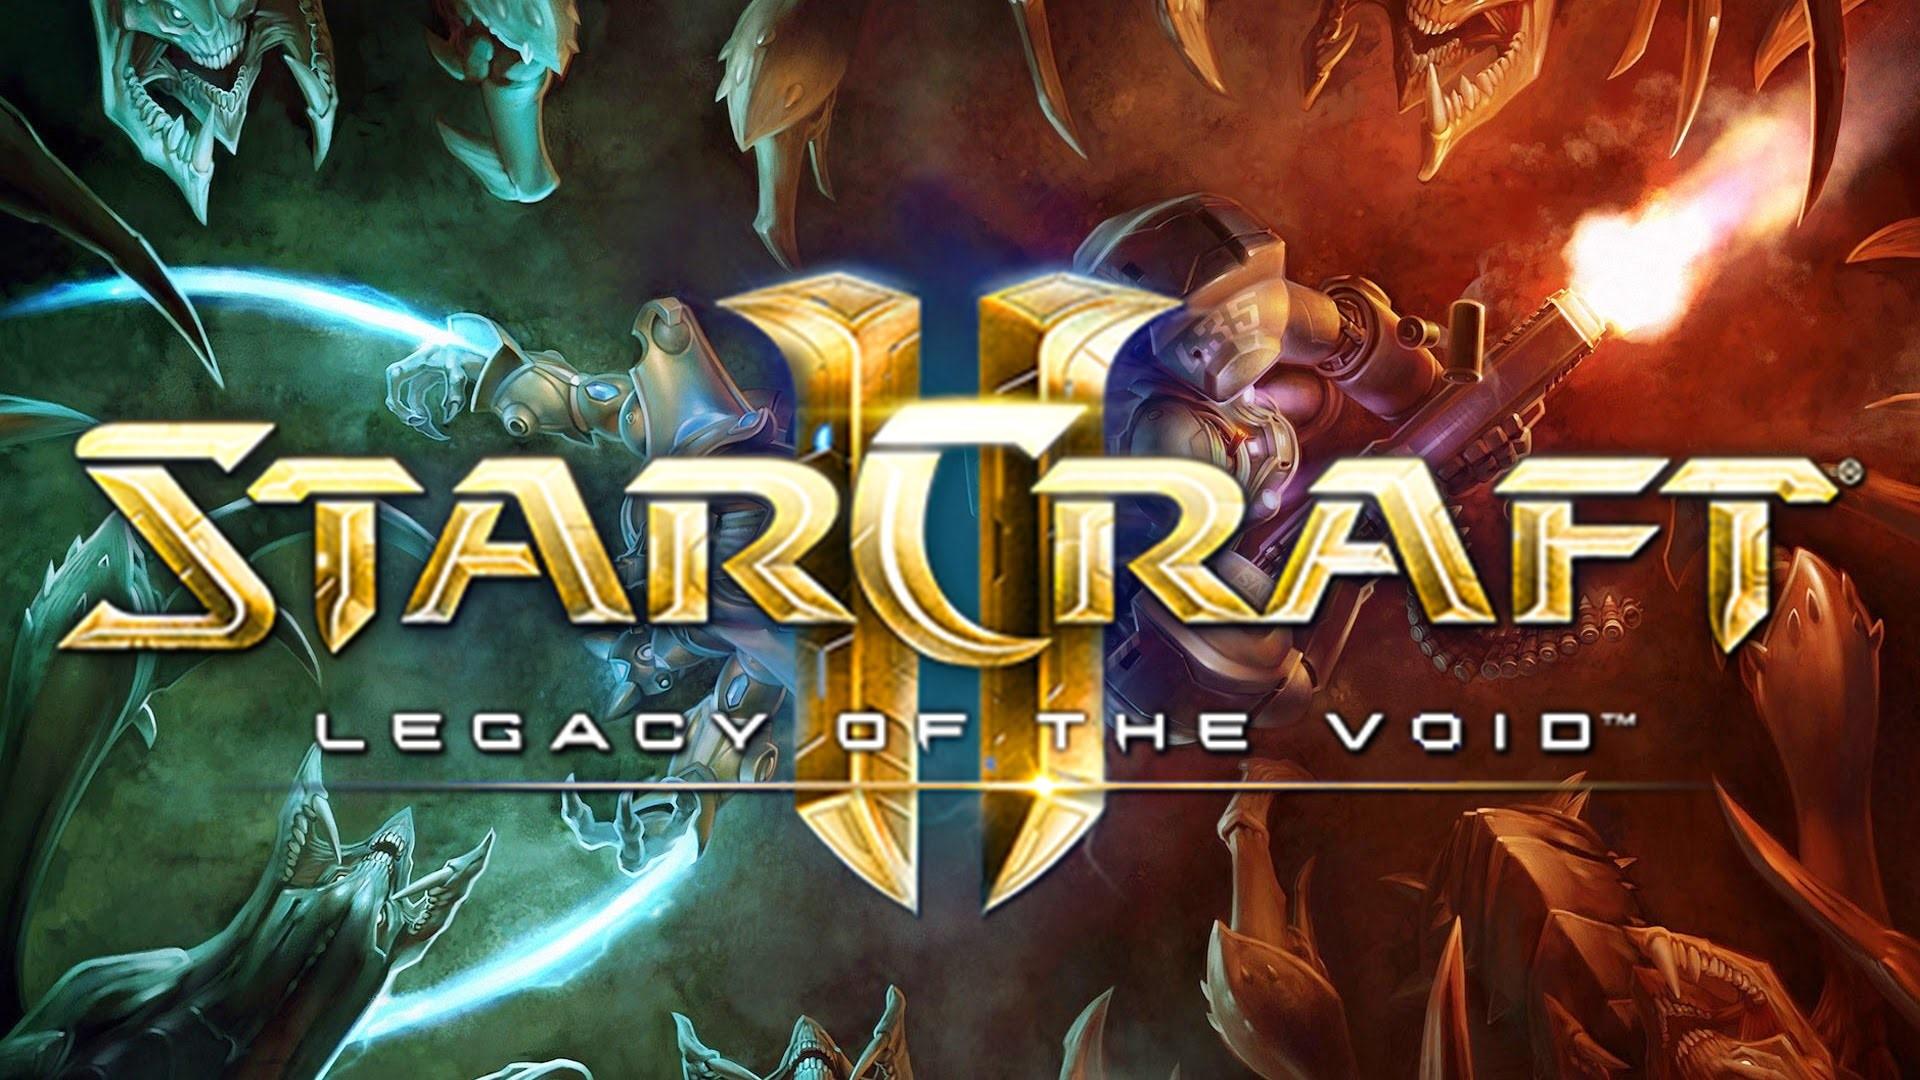 STARCRAFT II: LEGACY OF THE VOID [Полный доступ]